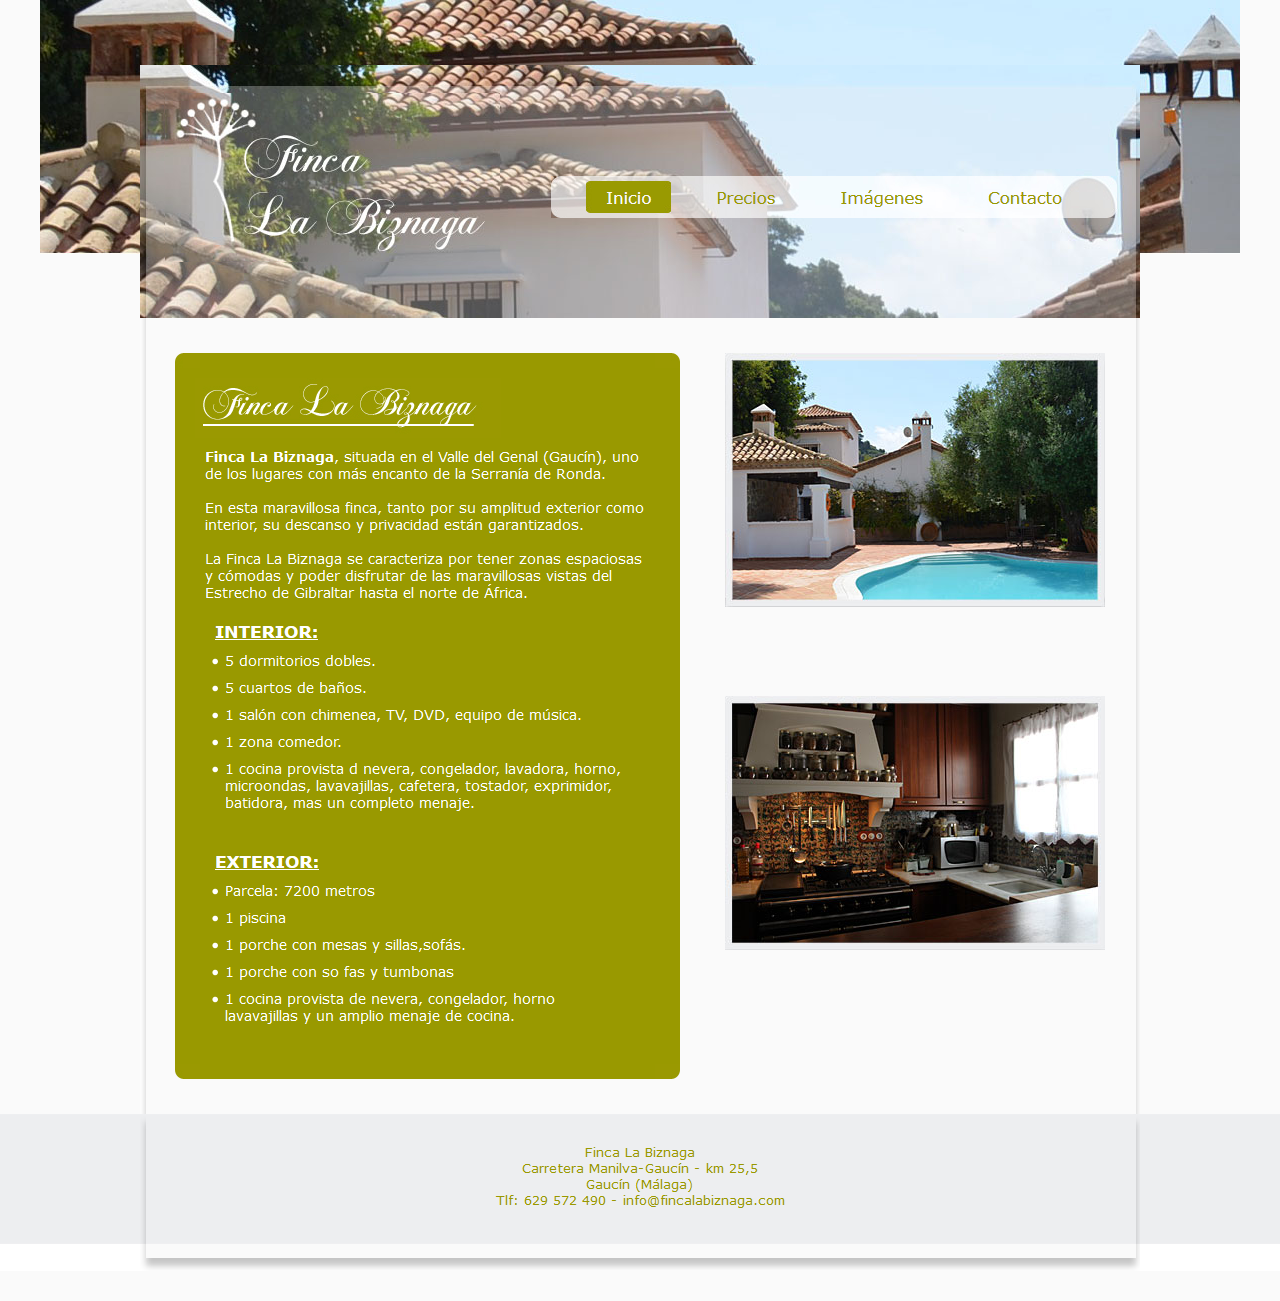 Finca La Biznaga - Gaucín (Málaga). Html, Css, Javascript, Jquery, Php, Mysql, Dreamweaver, Photoshop. Año 2011